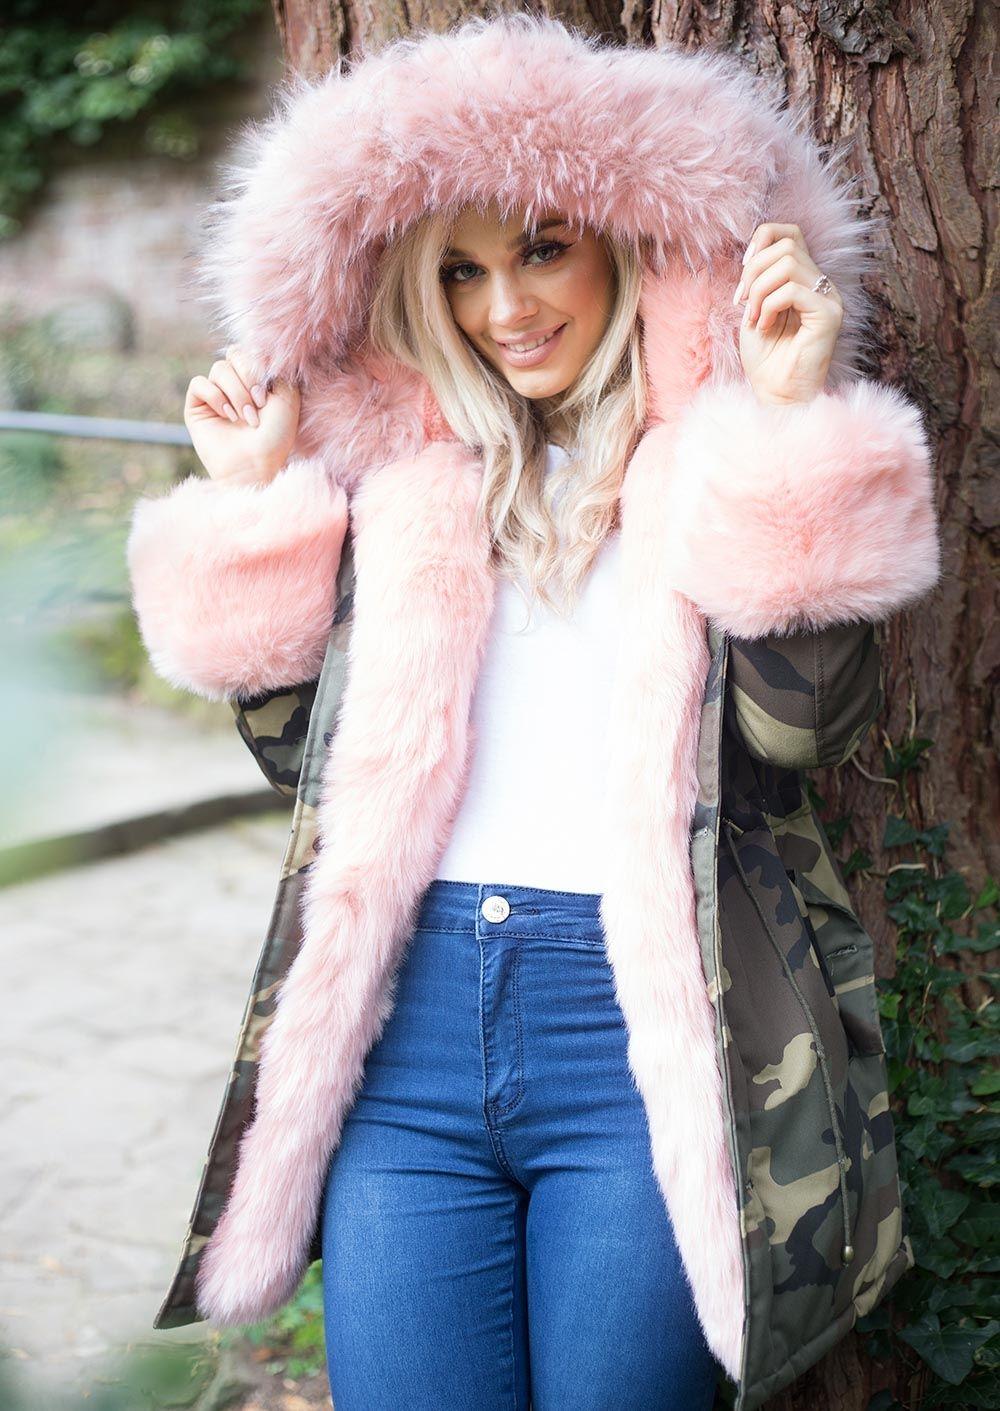 b0832fee2e5a6 Pink Faux Fur Hooded With Cuffs Full Fleece Parka Camo Khaki Green. Faux  Fur Parka, Parka Coat, Fur Coat, Parka Outfit, Khaki Coat,